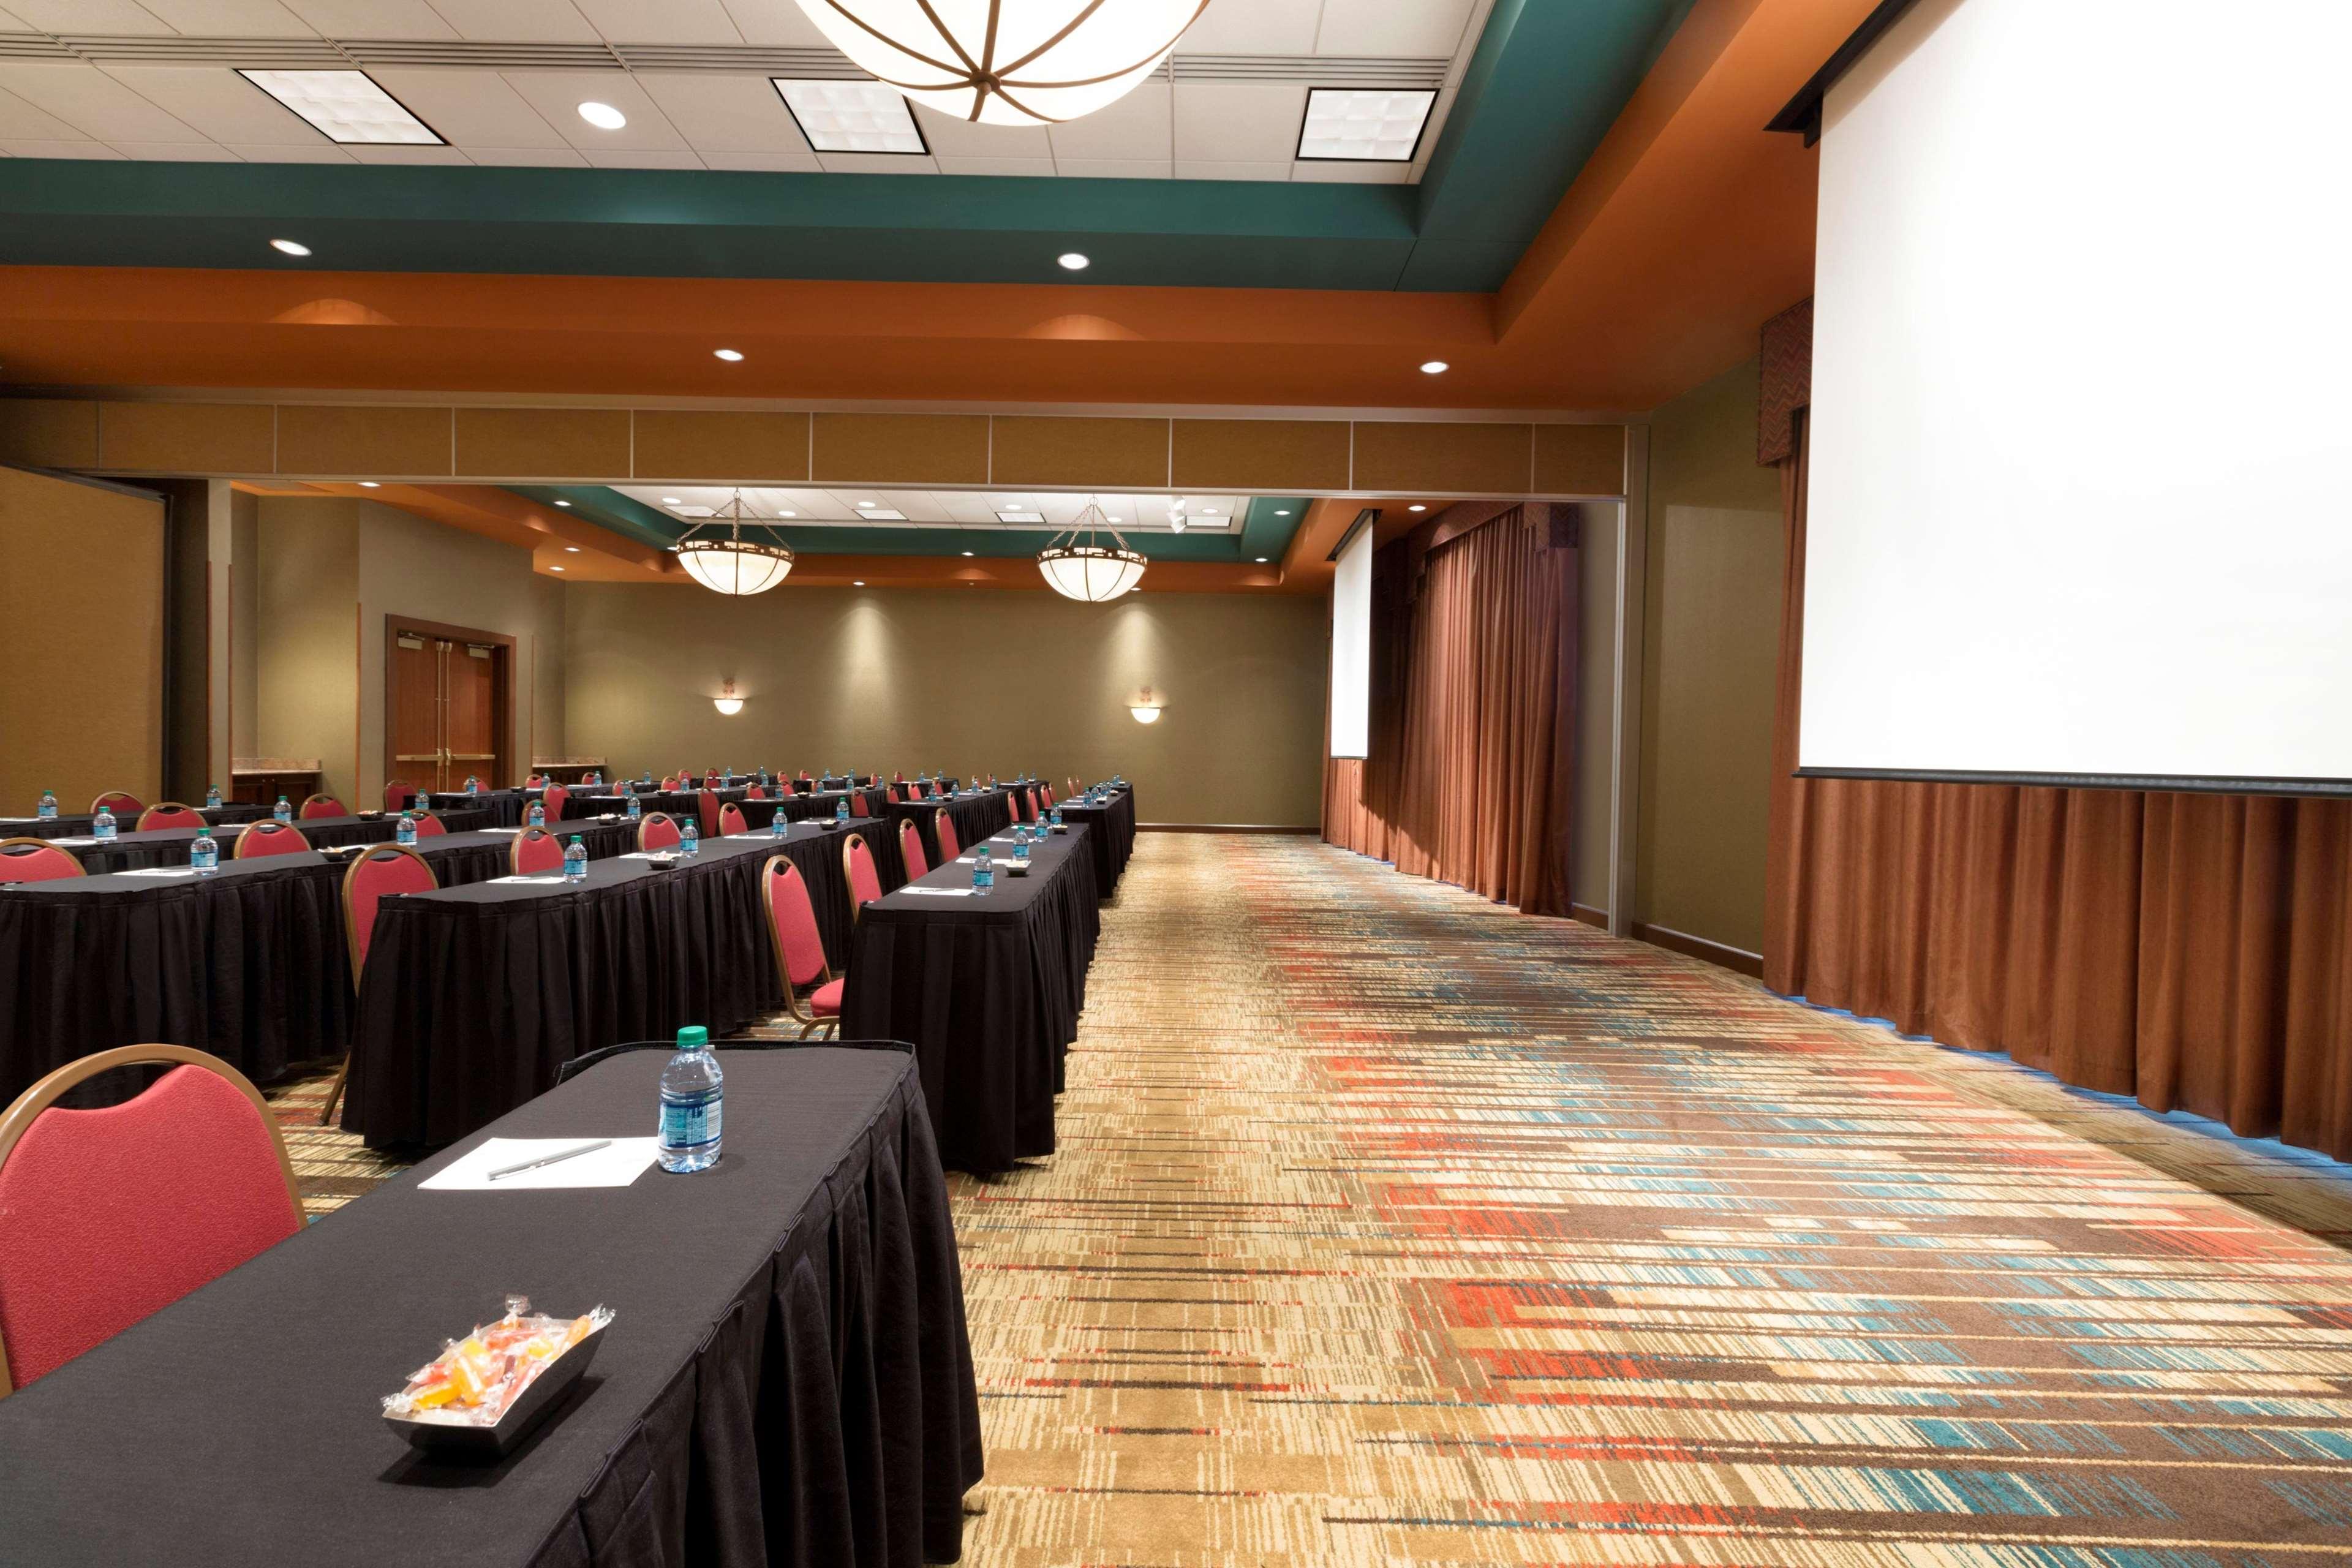 Embassy Suites by Hilton Albuquerque Hotel & Spa image 46